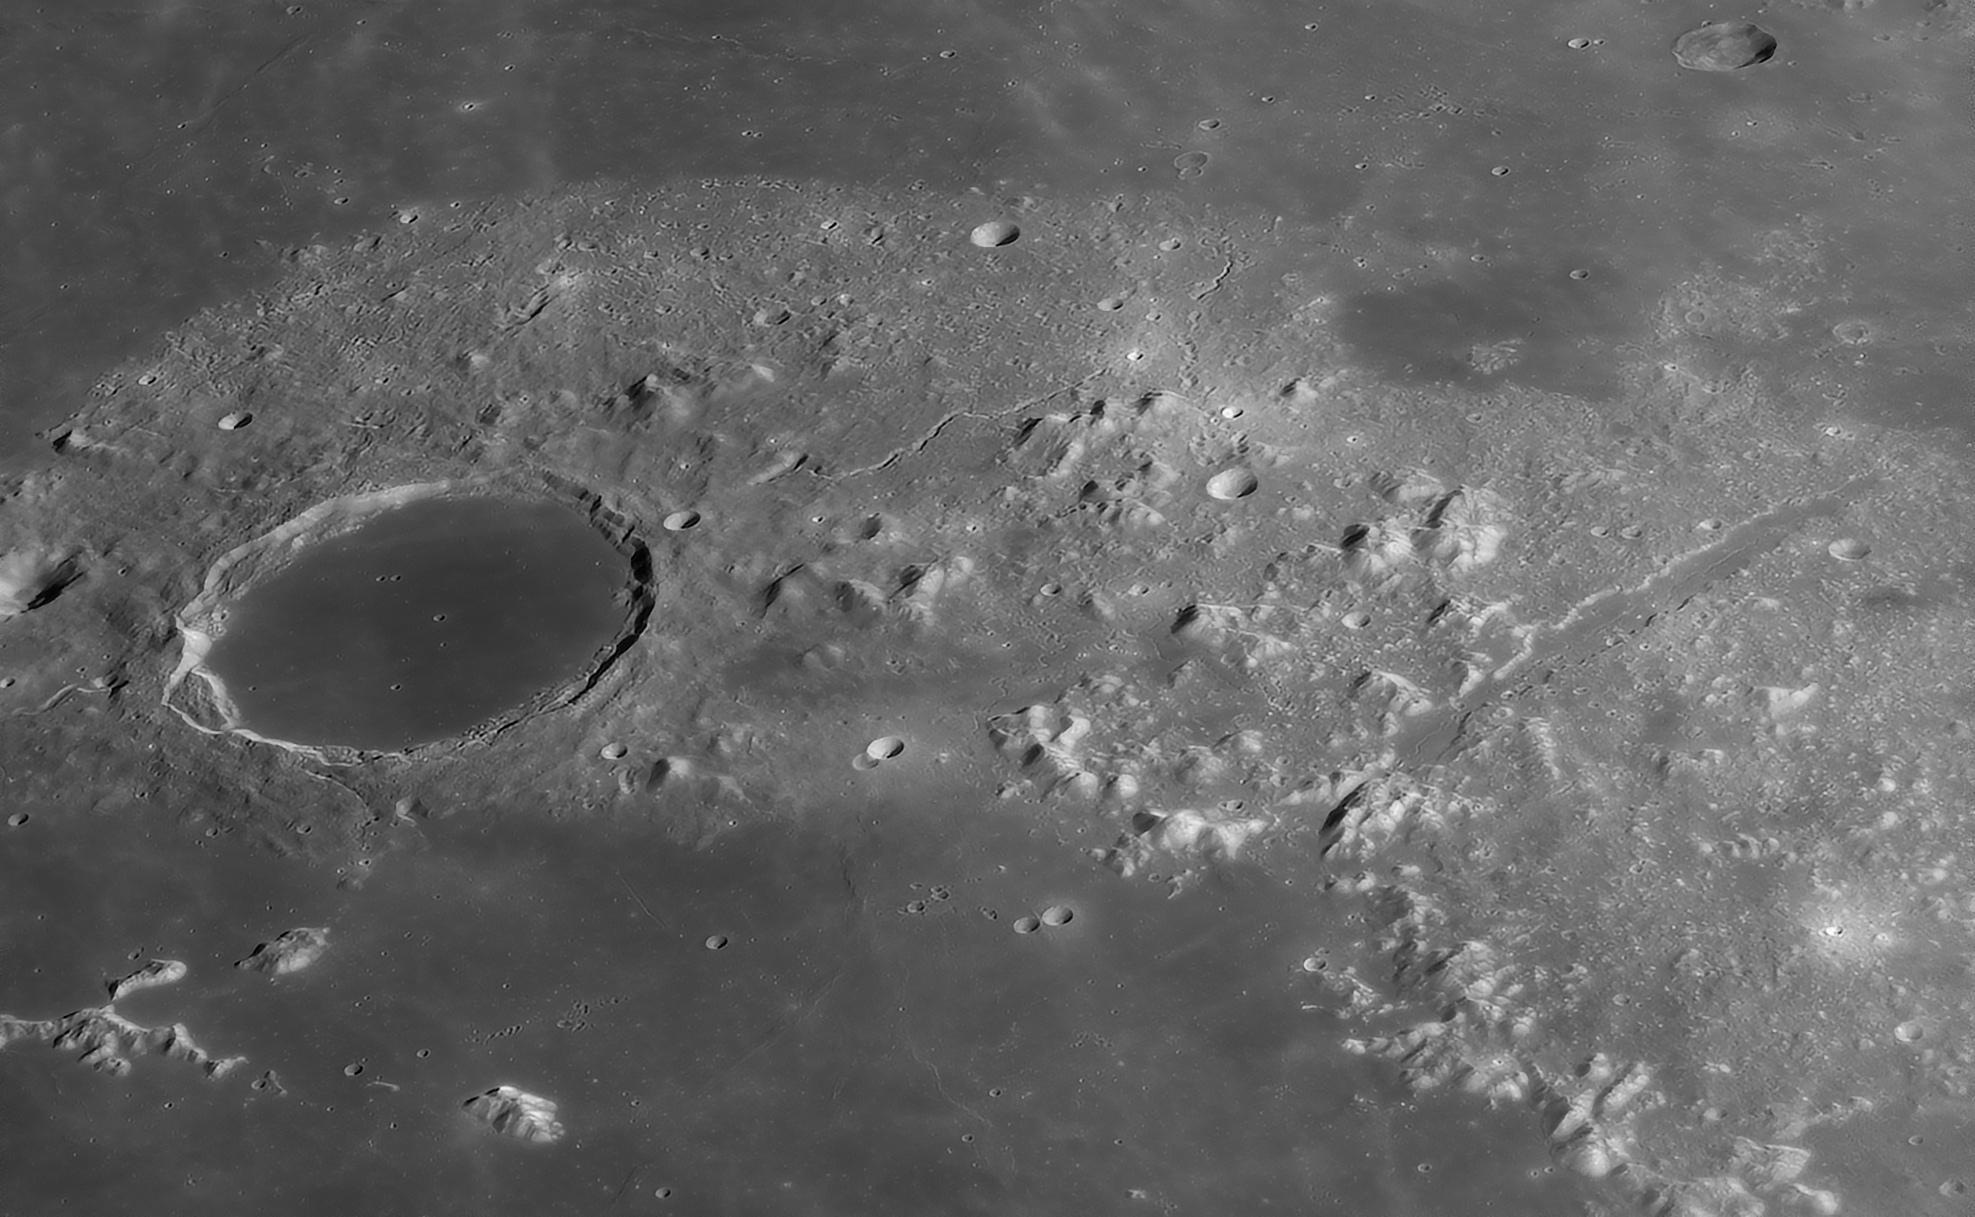 Plato et Valles Alpis au C14, le 4 Avril 2020: 650 images, caméra 174MM, Baader FFC, ADC Pierro AStro, filtre Astronomik orange 2c